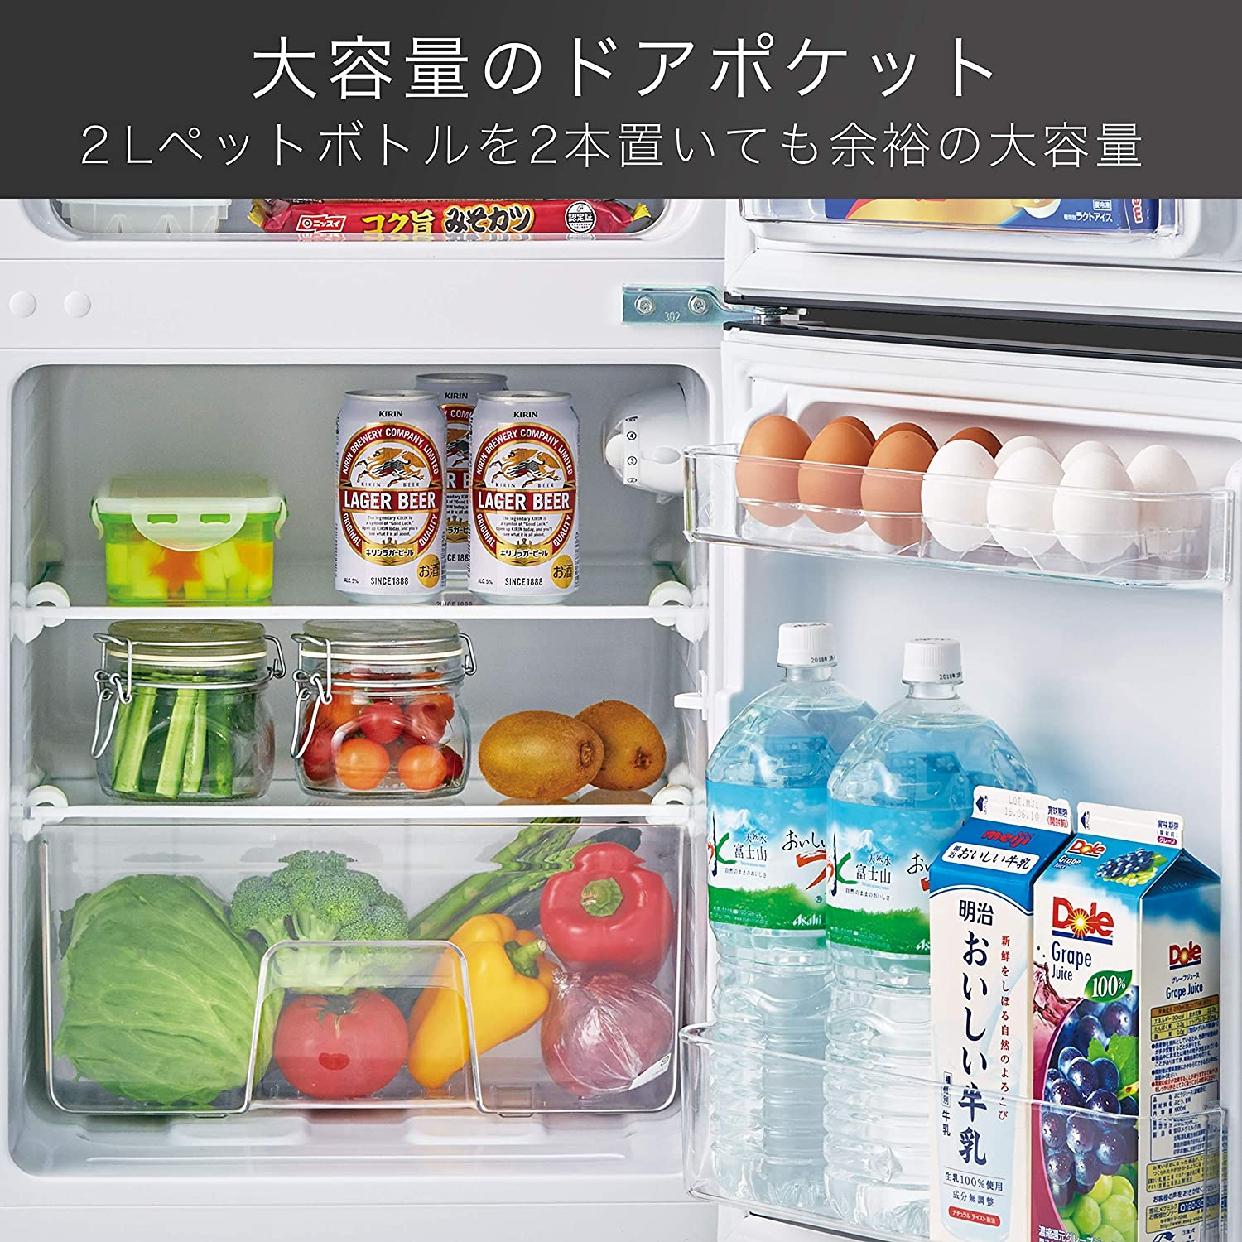 Hisense(ハイセンス)93L 冷凍冷蔵庫 HR-B95Aの商品画像2